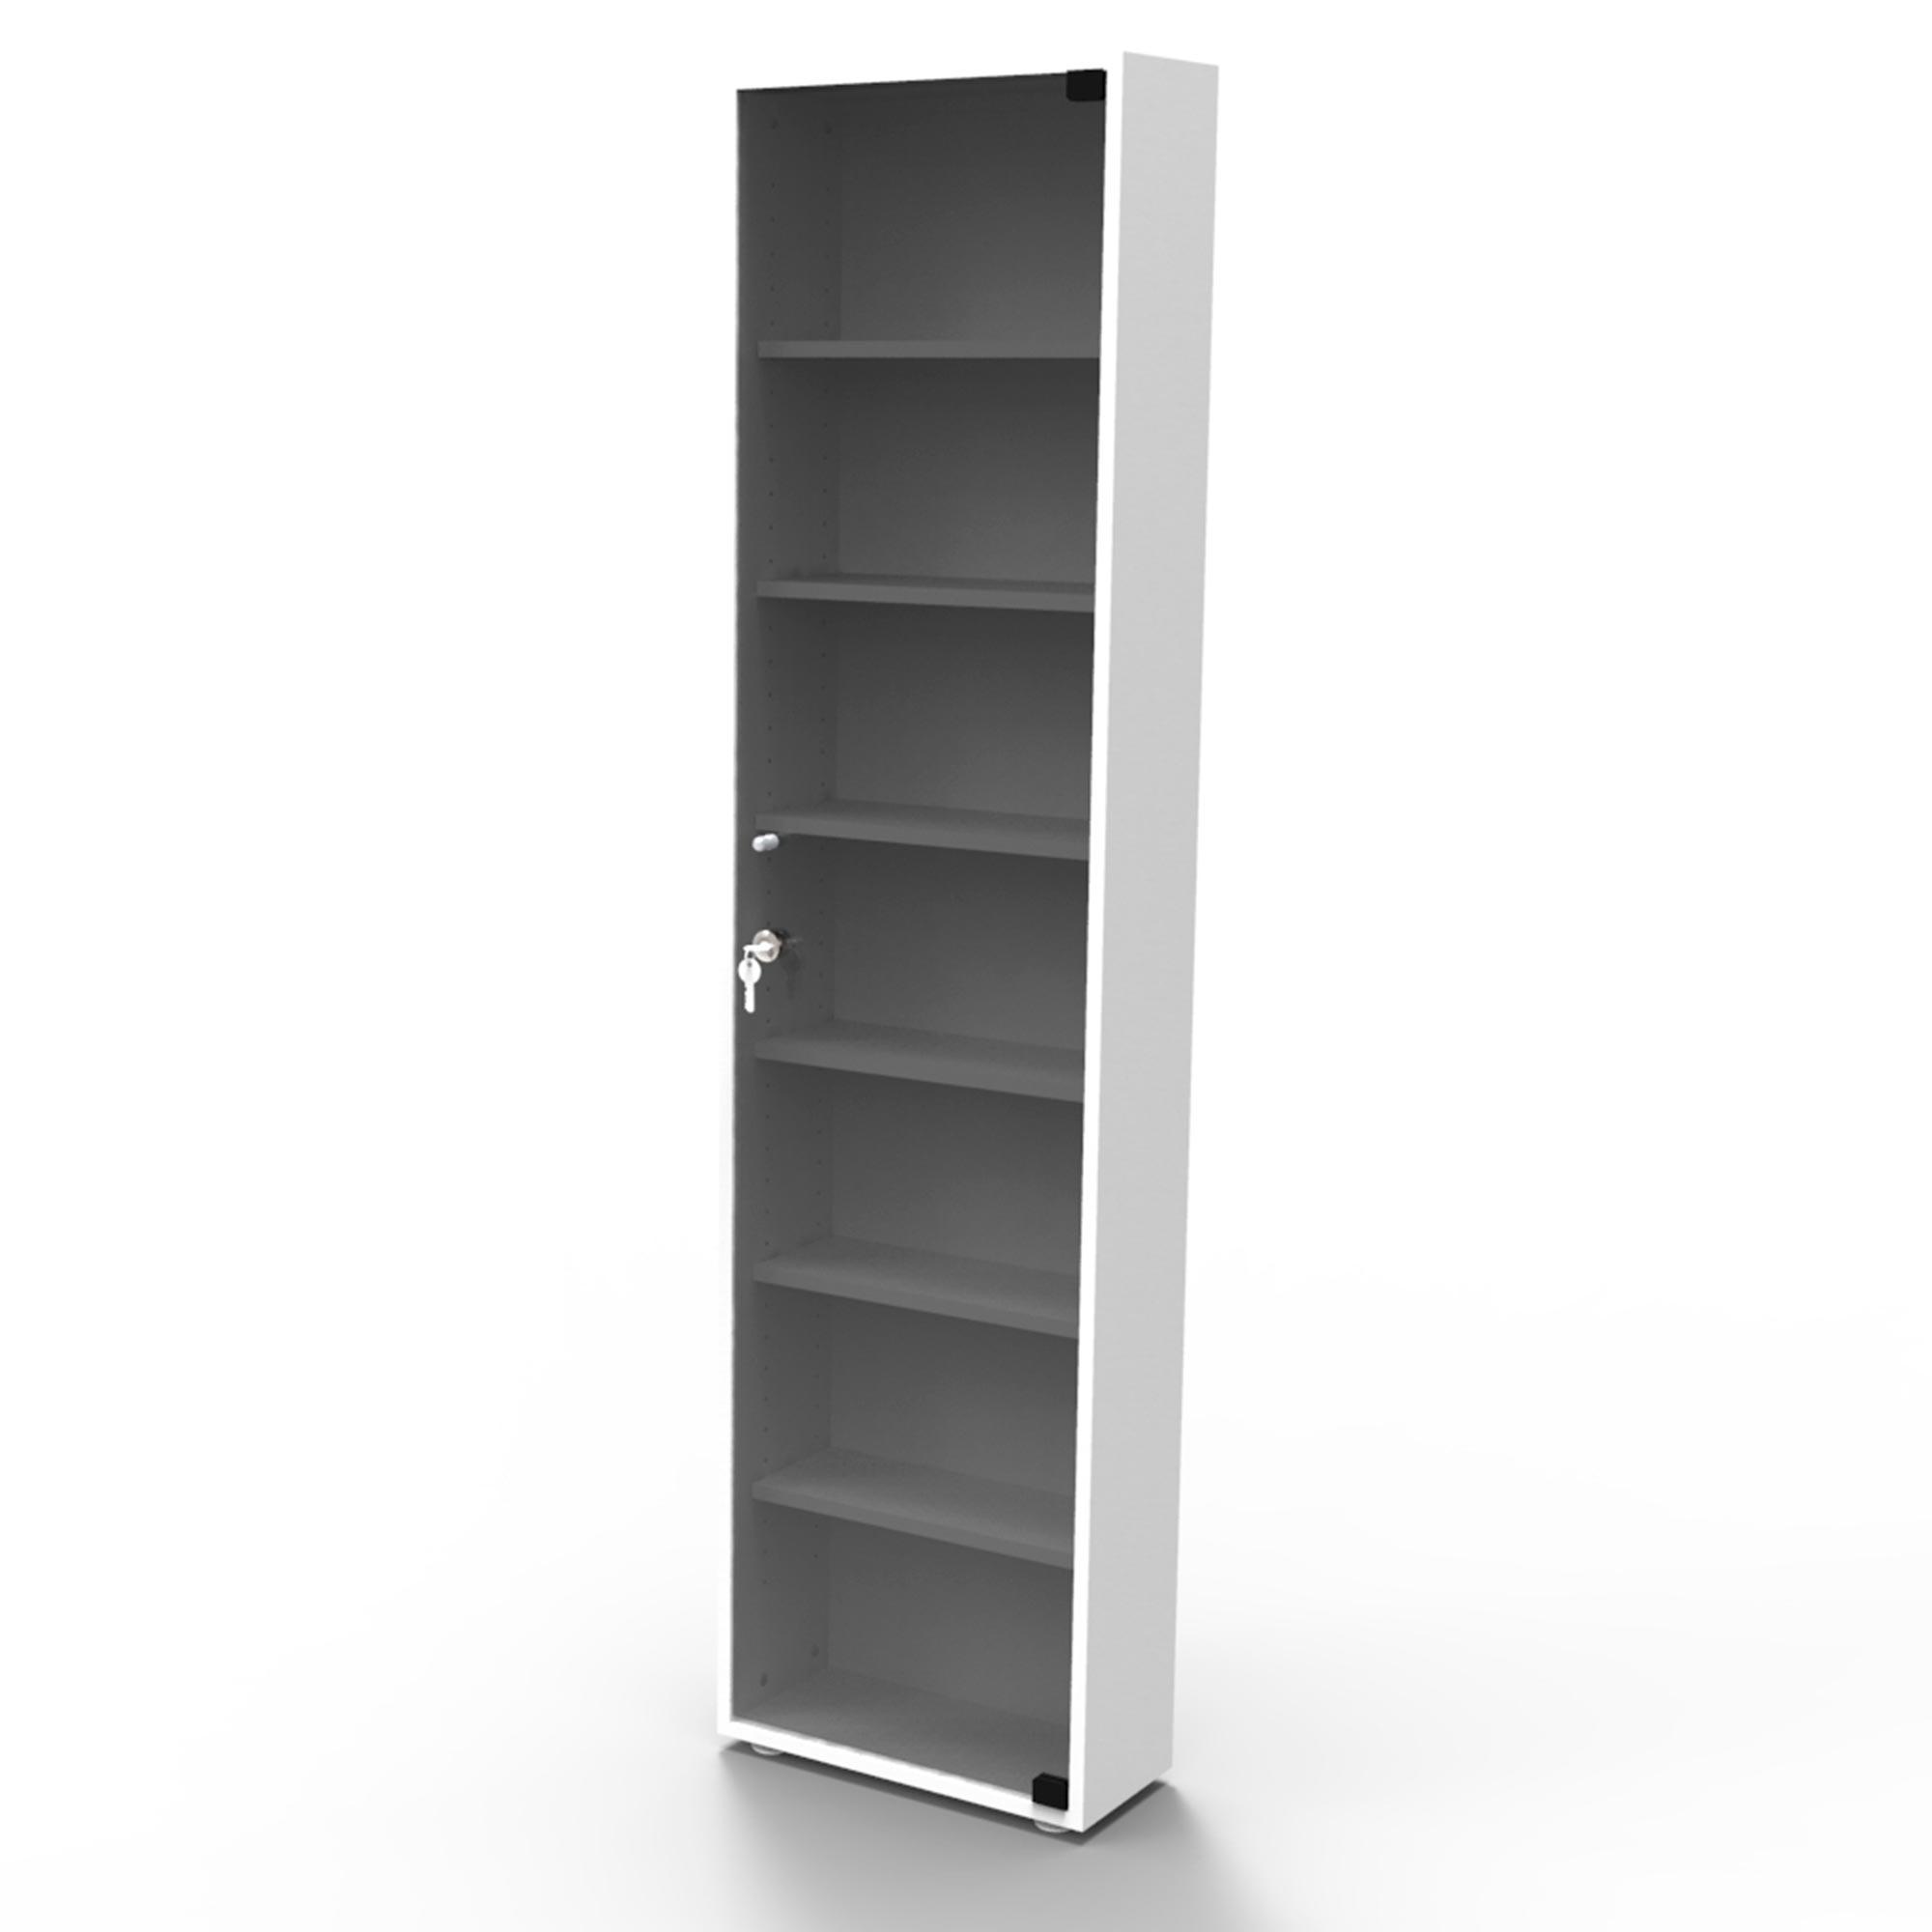 Estante 175 DVDs branca + porta vidro fumê com chave DV175BRF Bürohaus